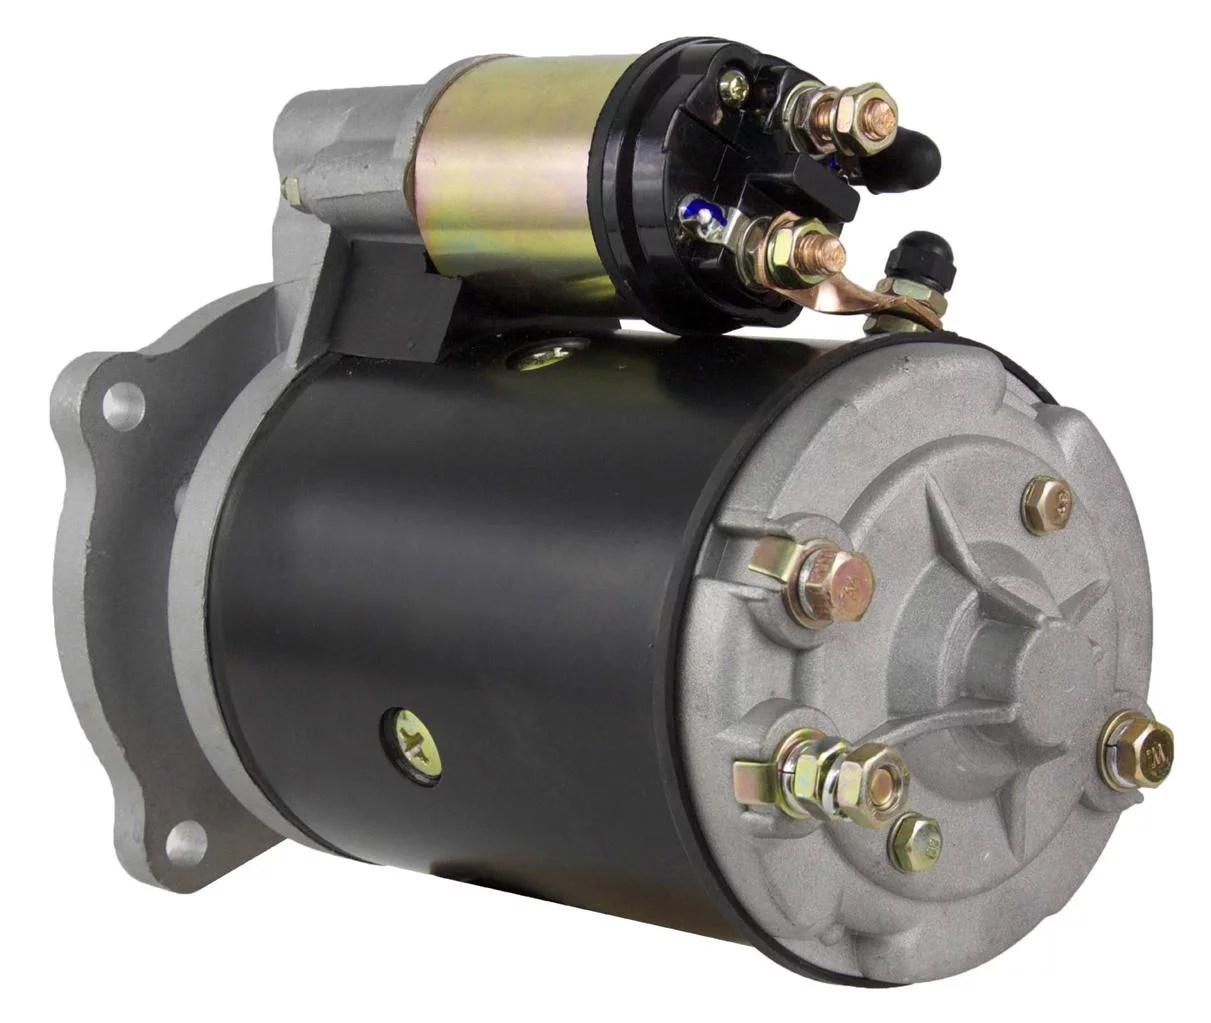 hight resolution of new starter motor fits ford tractor 7200 7400 7600 7700 7710 26339a 26339b 26339d 26339e 26339f 26339g 26339h 26339i 26339j walmart com